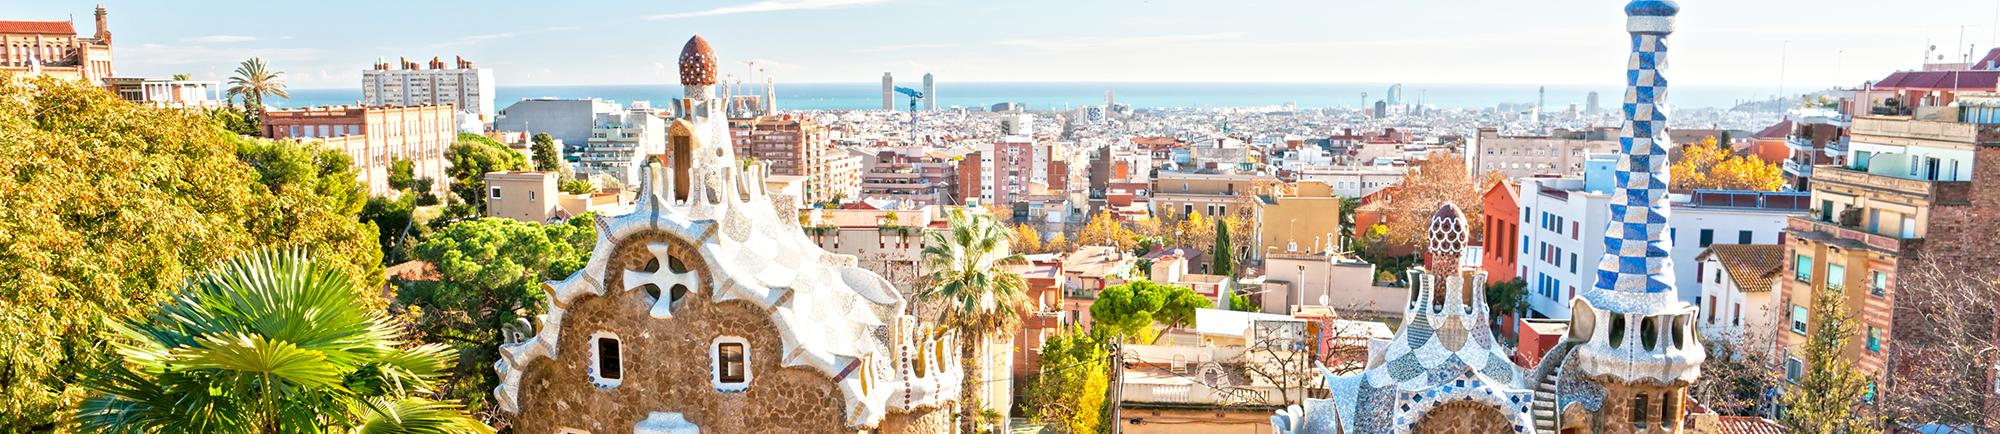 Scooter Rental in Barcelona